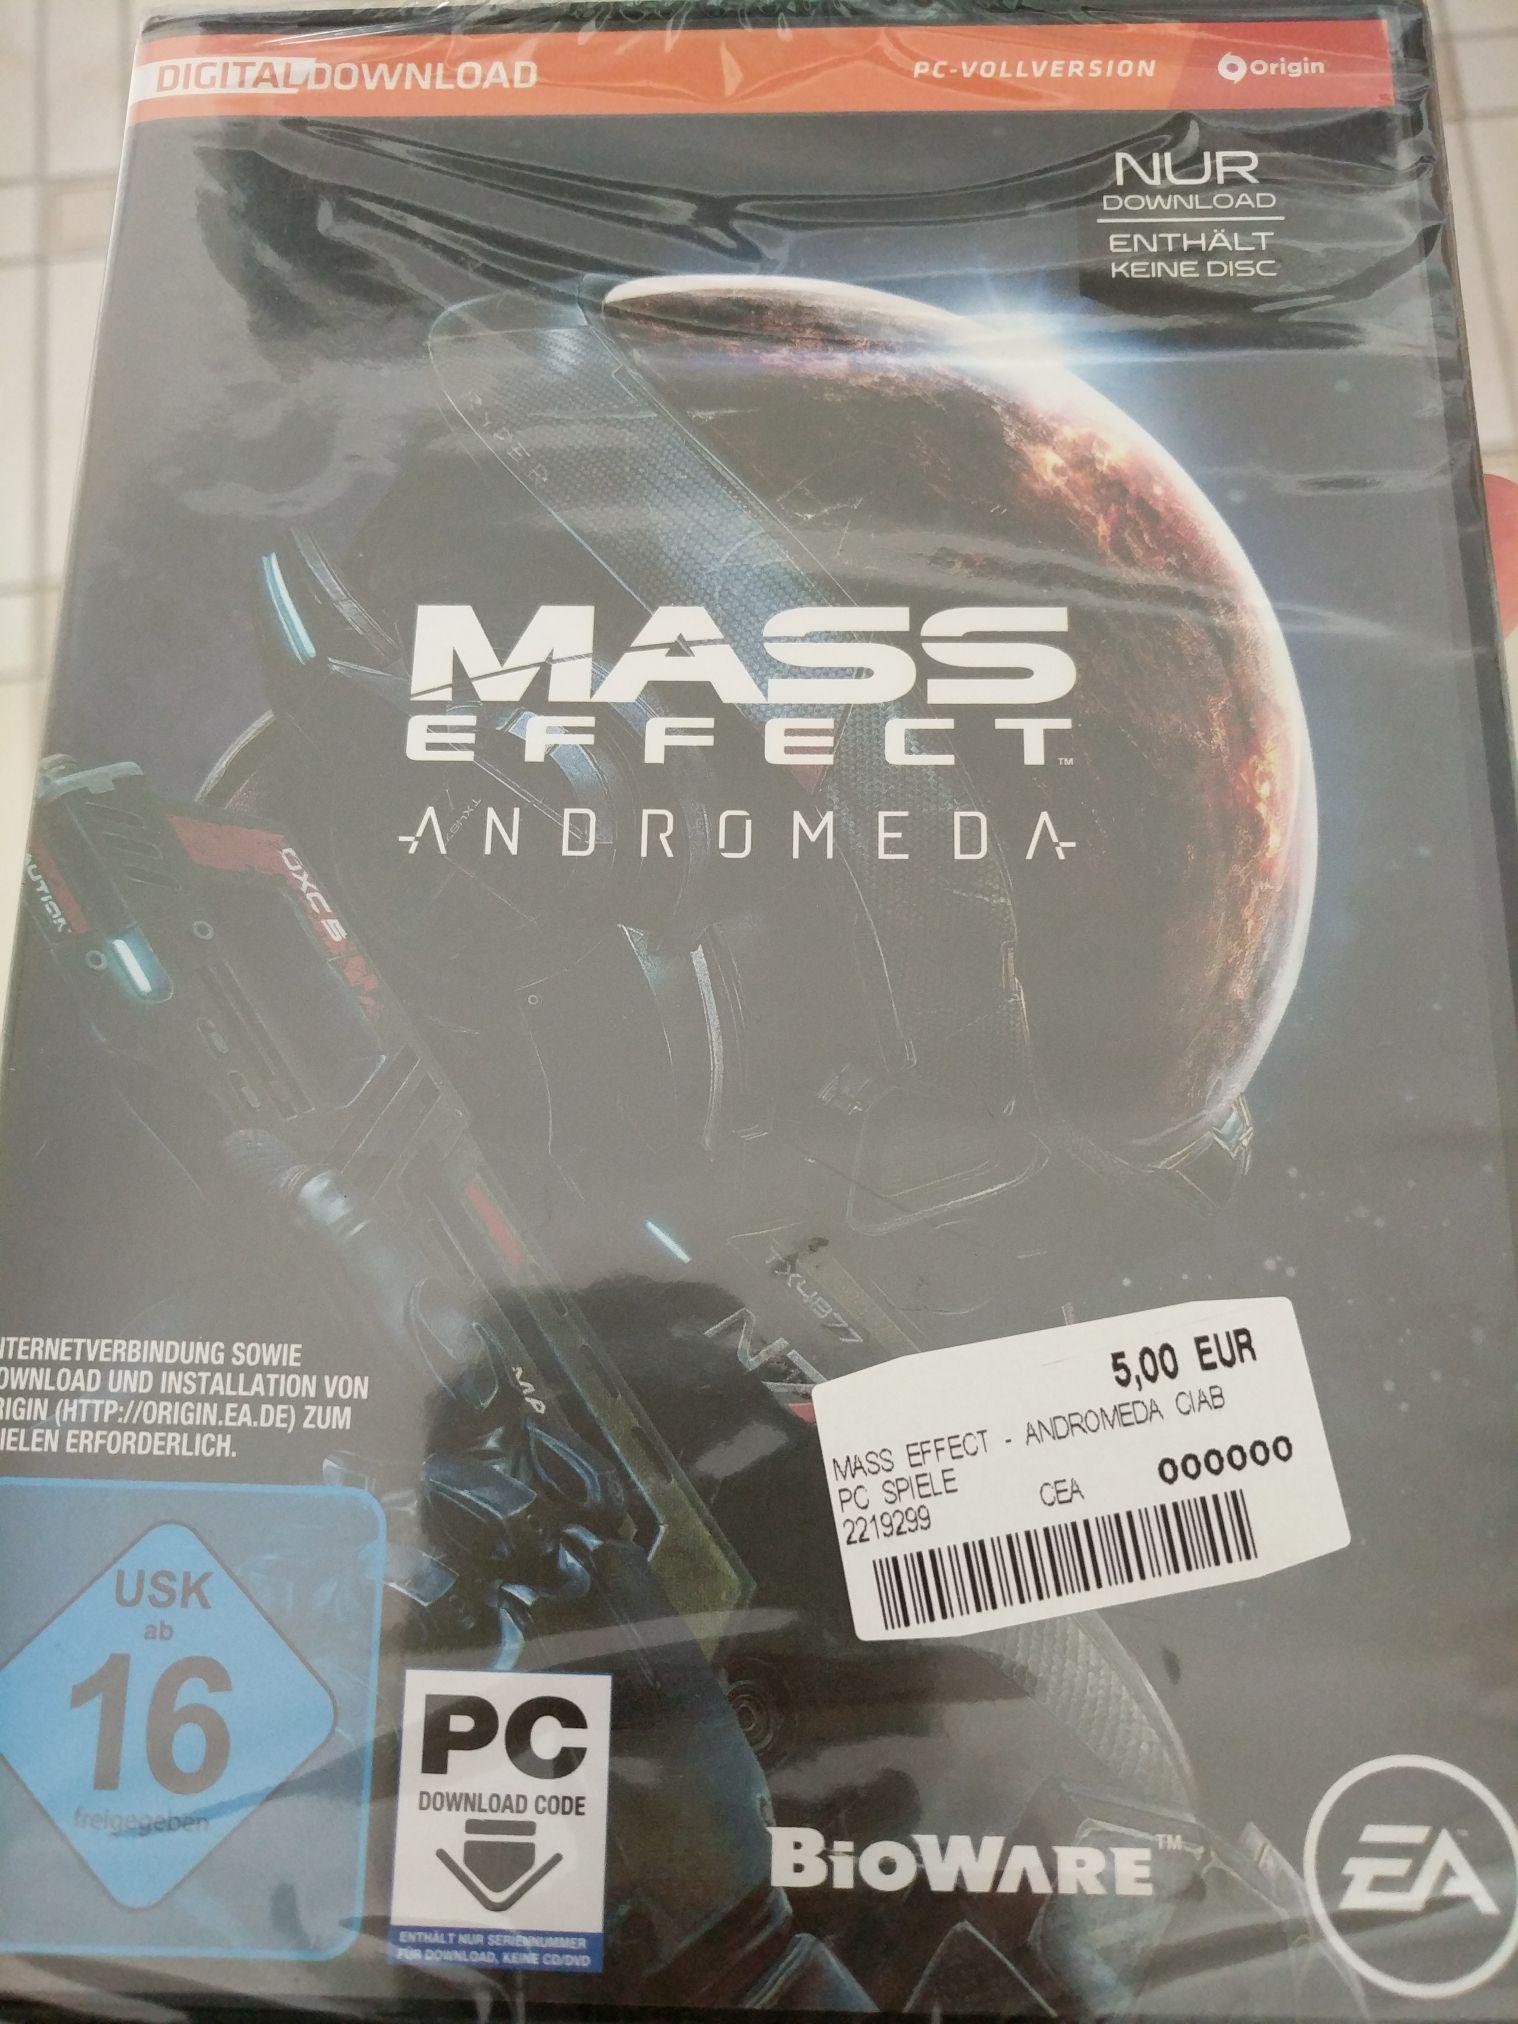 [Lokal HH] [Mediamarkt] [PC] Mass Effect Andromeda